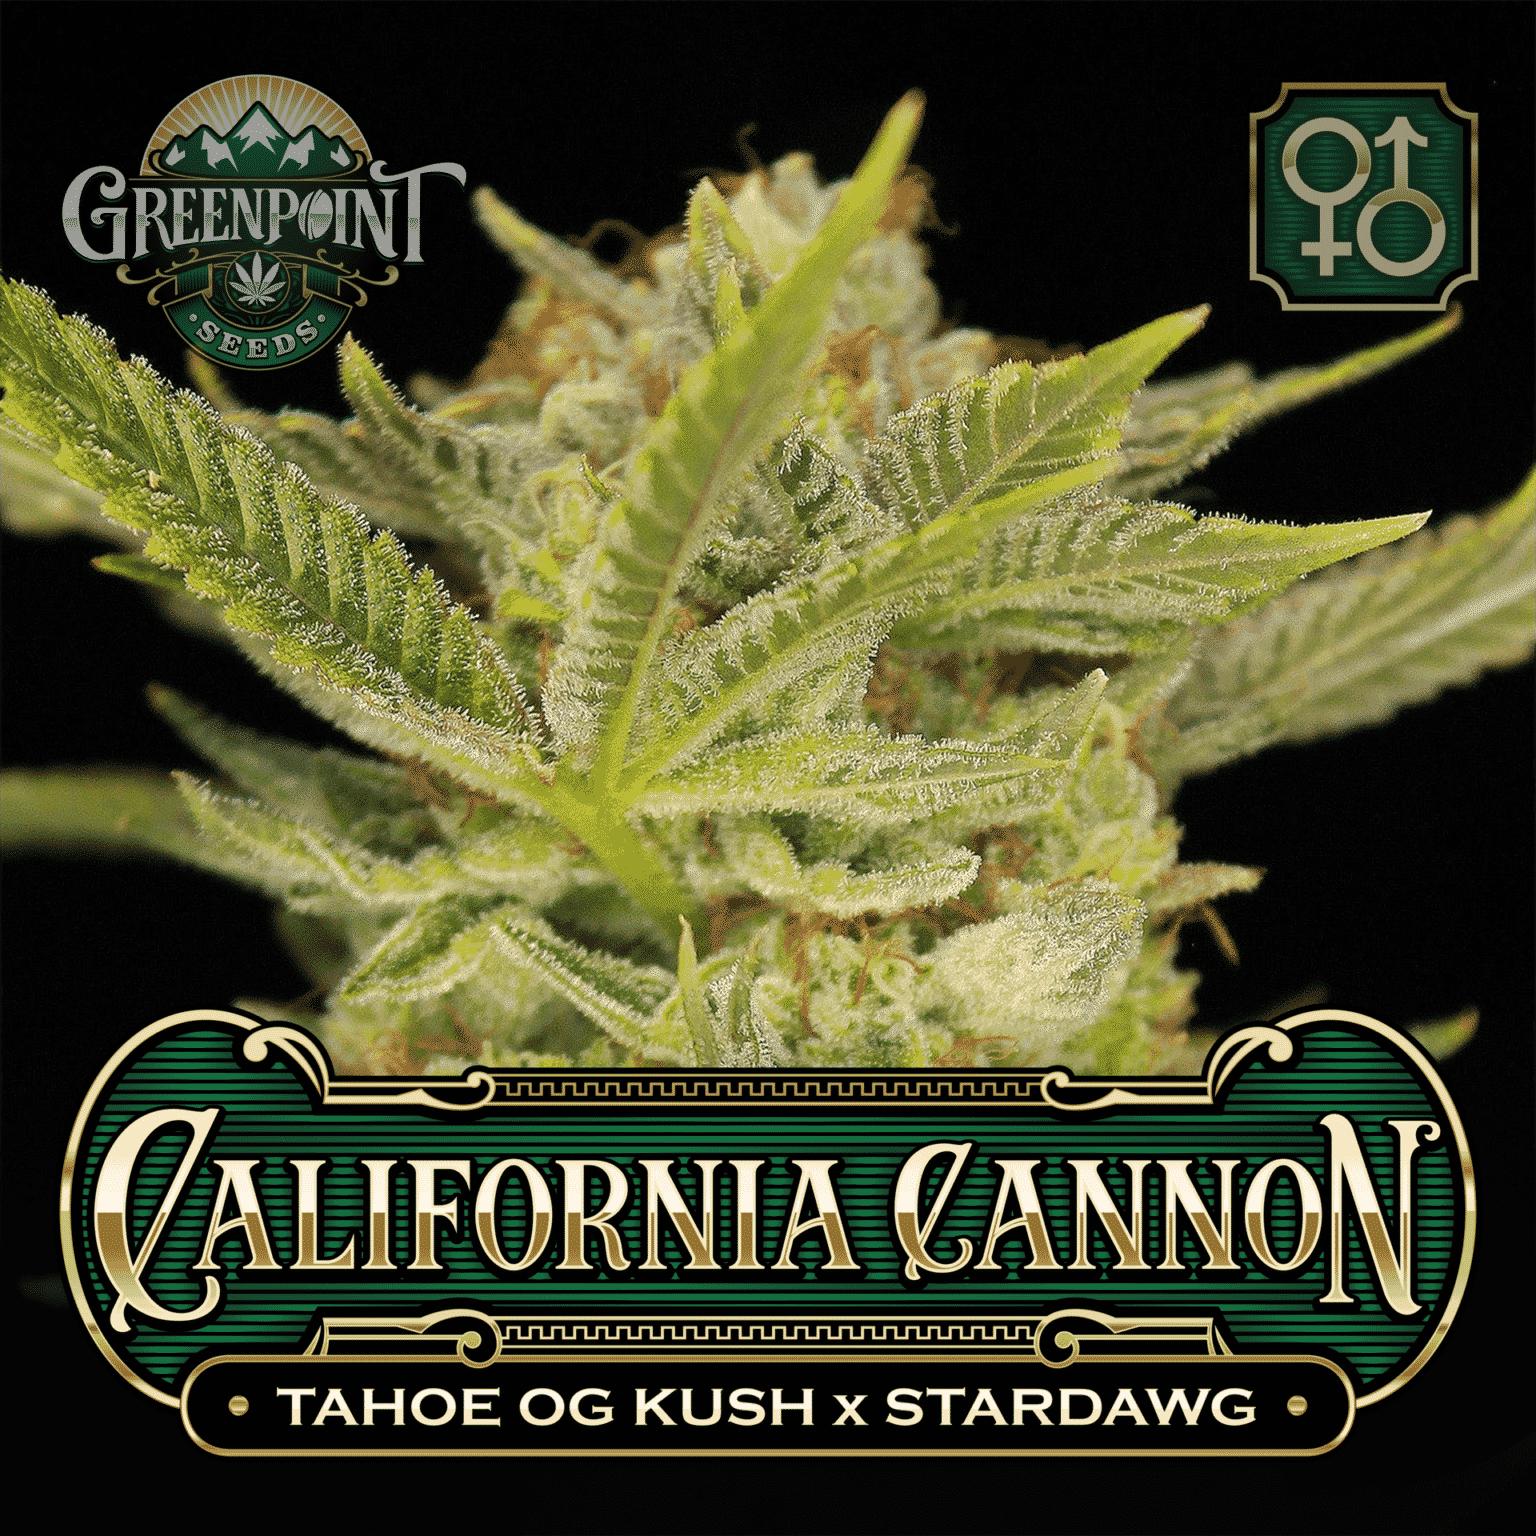 Tahoe OG Kush x Stardawg Seeds | California Cannon Cannabis Seeds - US Seed Bank